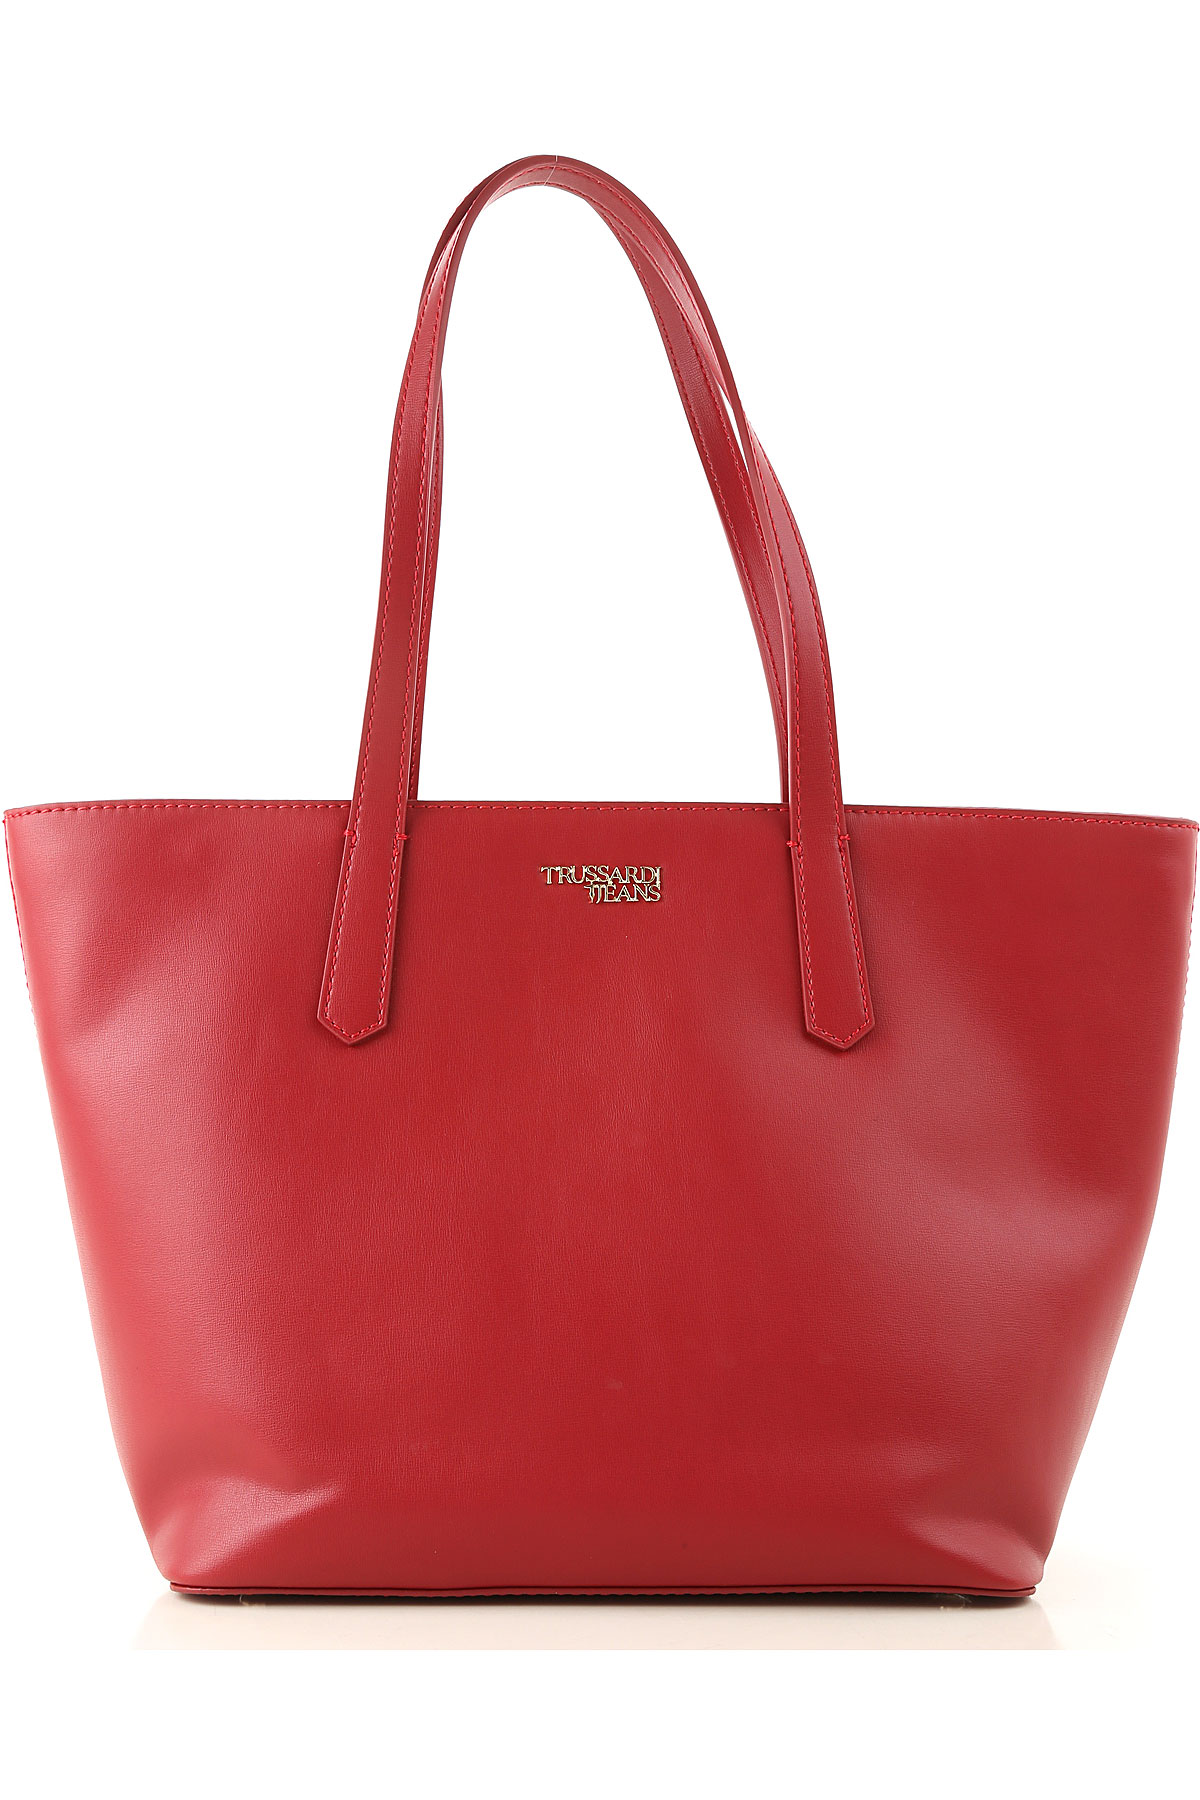 Trussardi Tote Bag On Sale, Garnet, Eco Leather, 2019